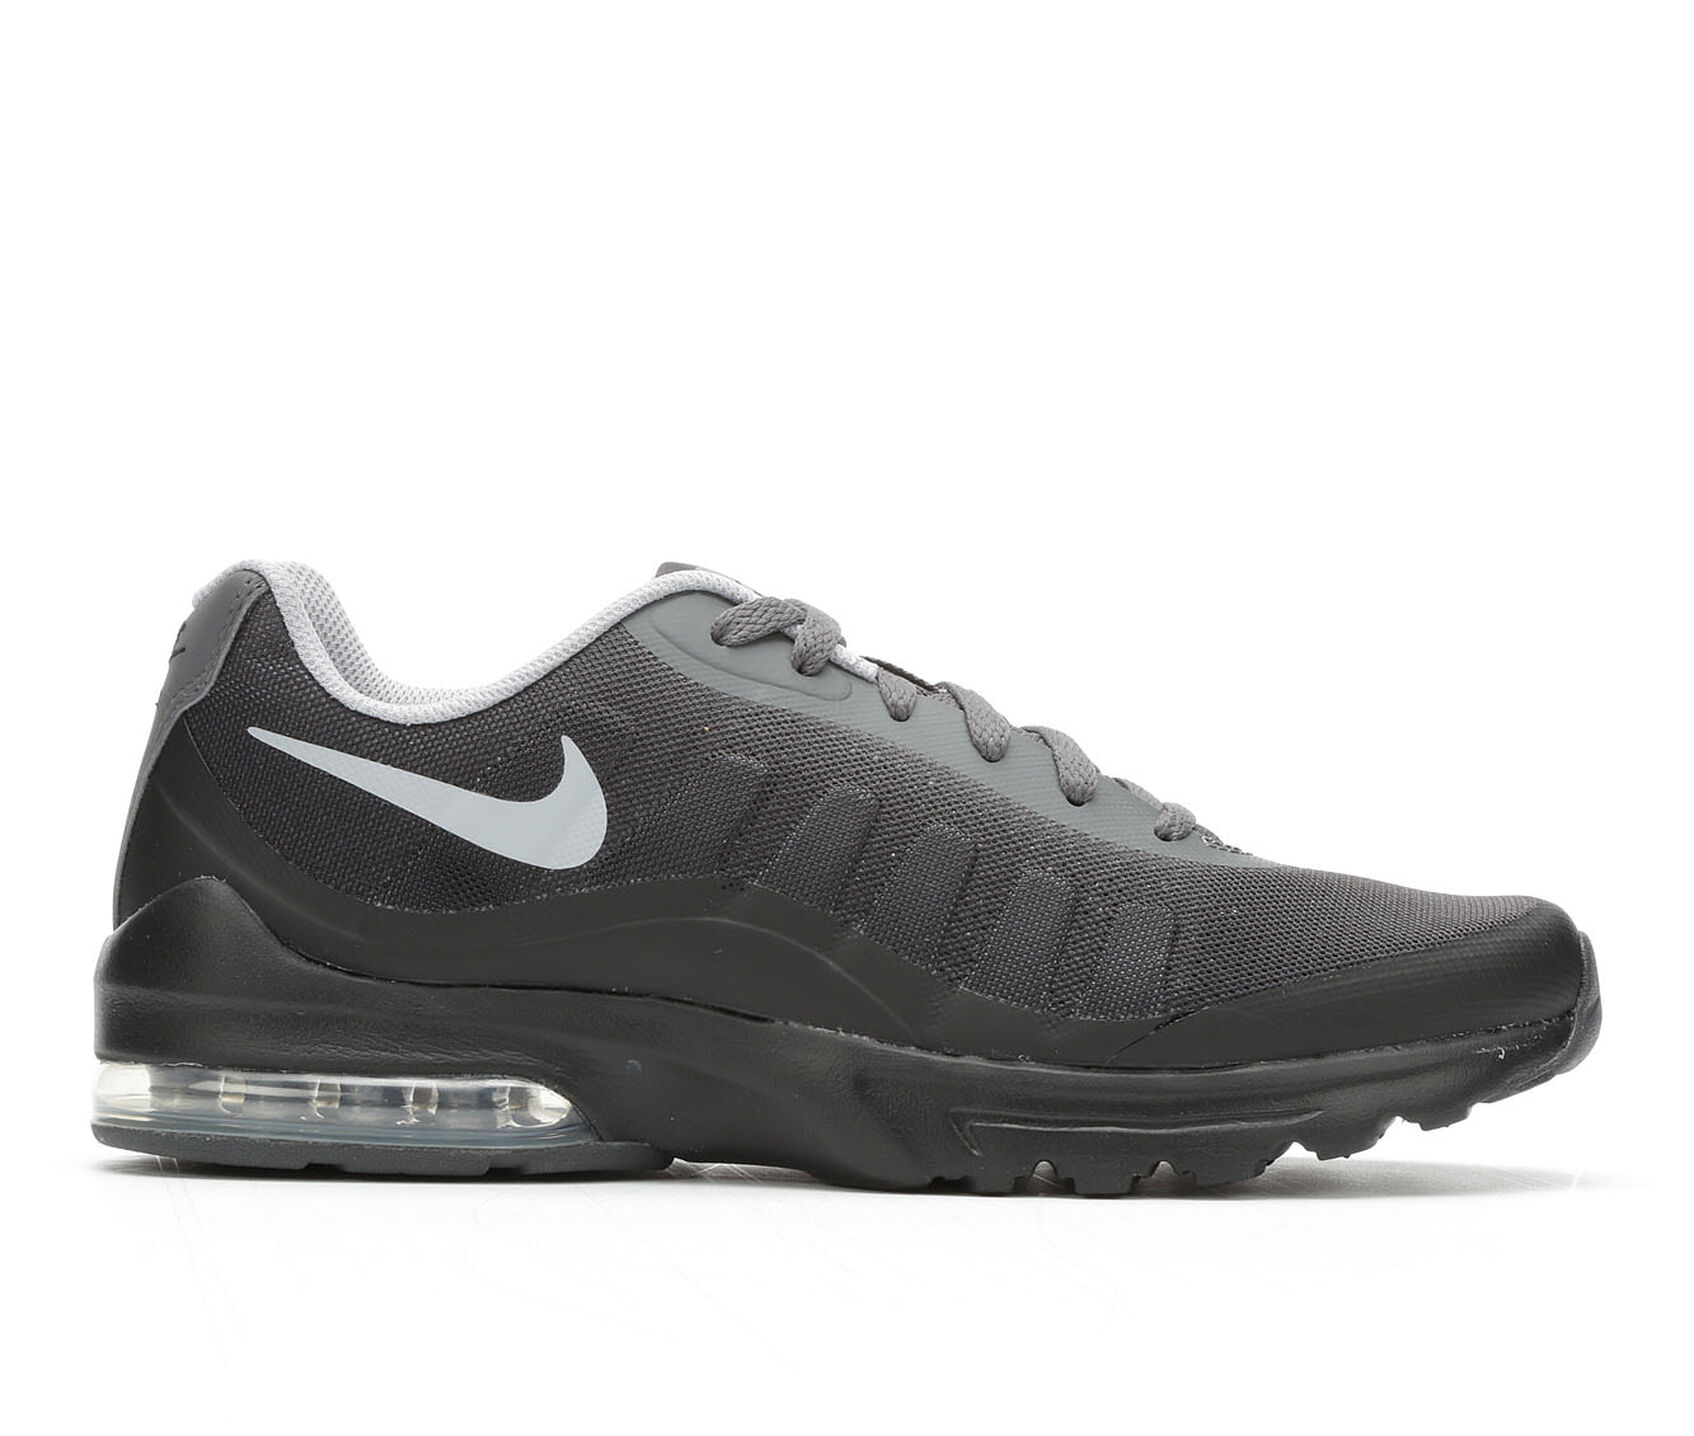 7eb4bf6e04 Men's Nike Air Max Invigor Print Athletic Sneakers | Shoe Carnival